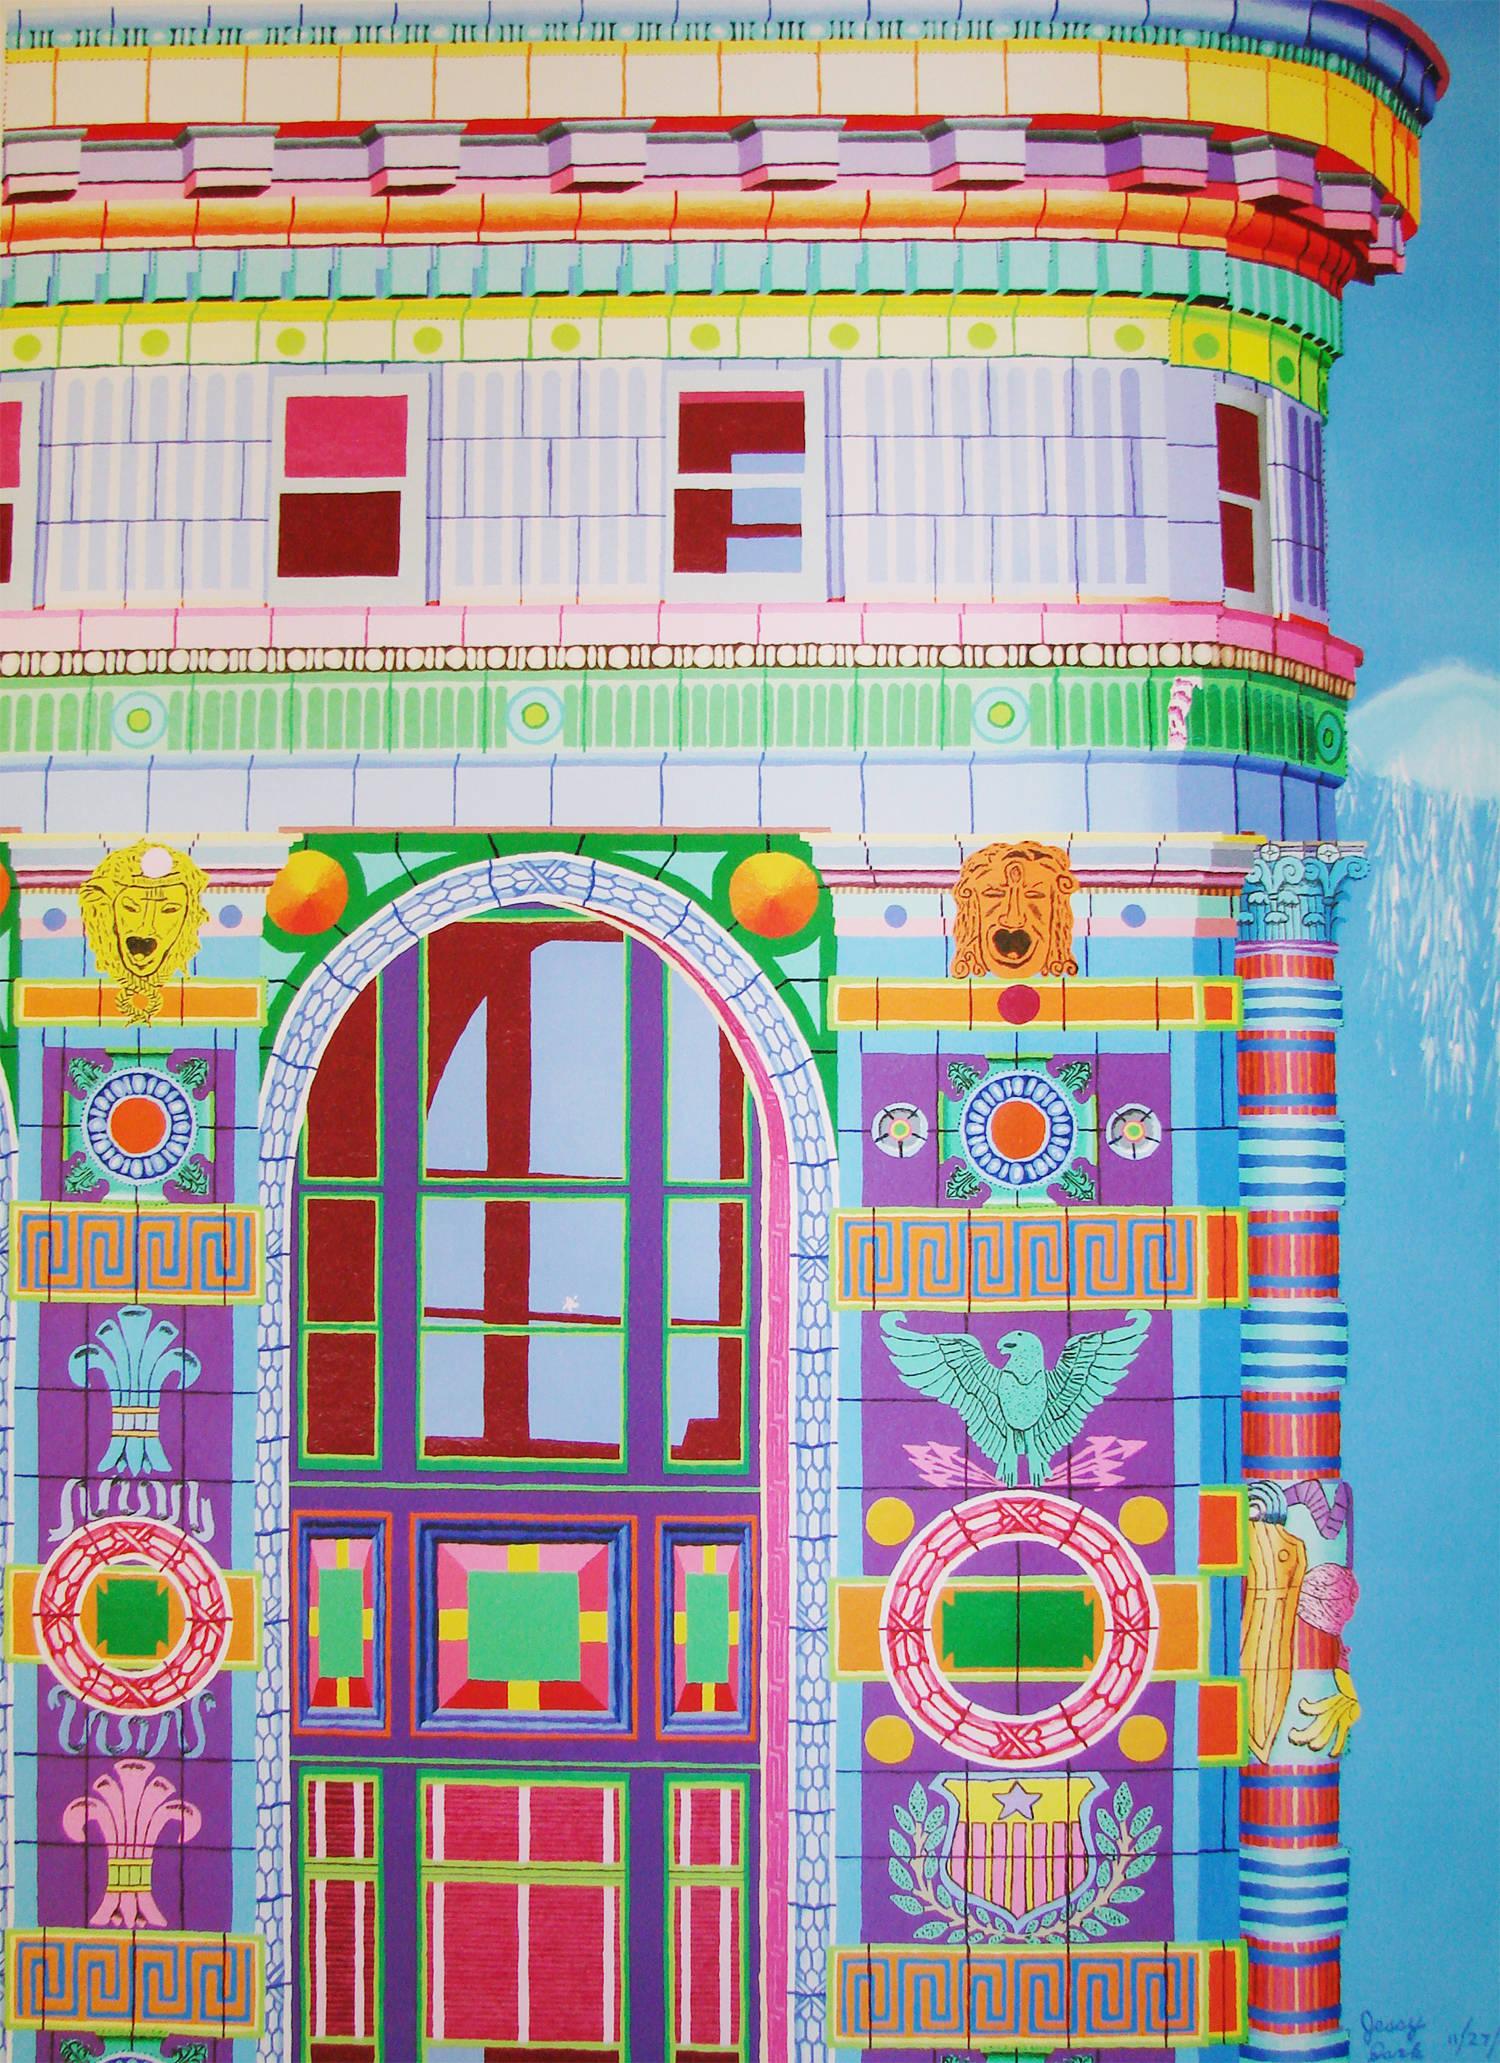 Flatiron Building by jessica park, autistic artist